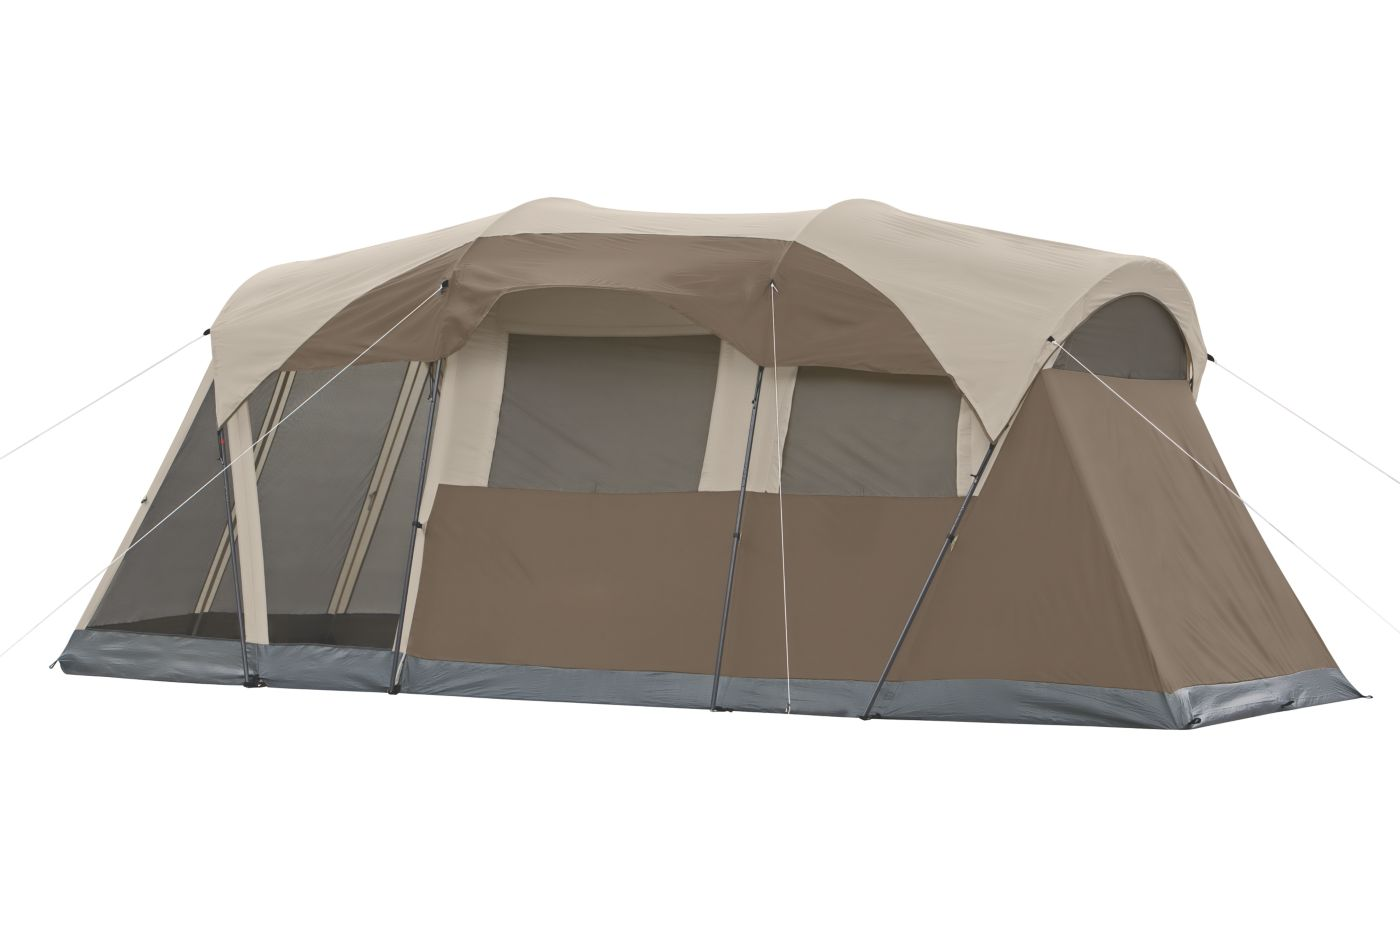 ... WeatherMaster® 6 Screened Tent ...  sc 1 st  Coleman & 6 Person Tent | Screened Tents | Coleman